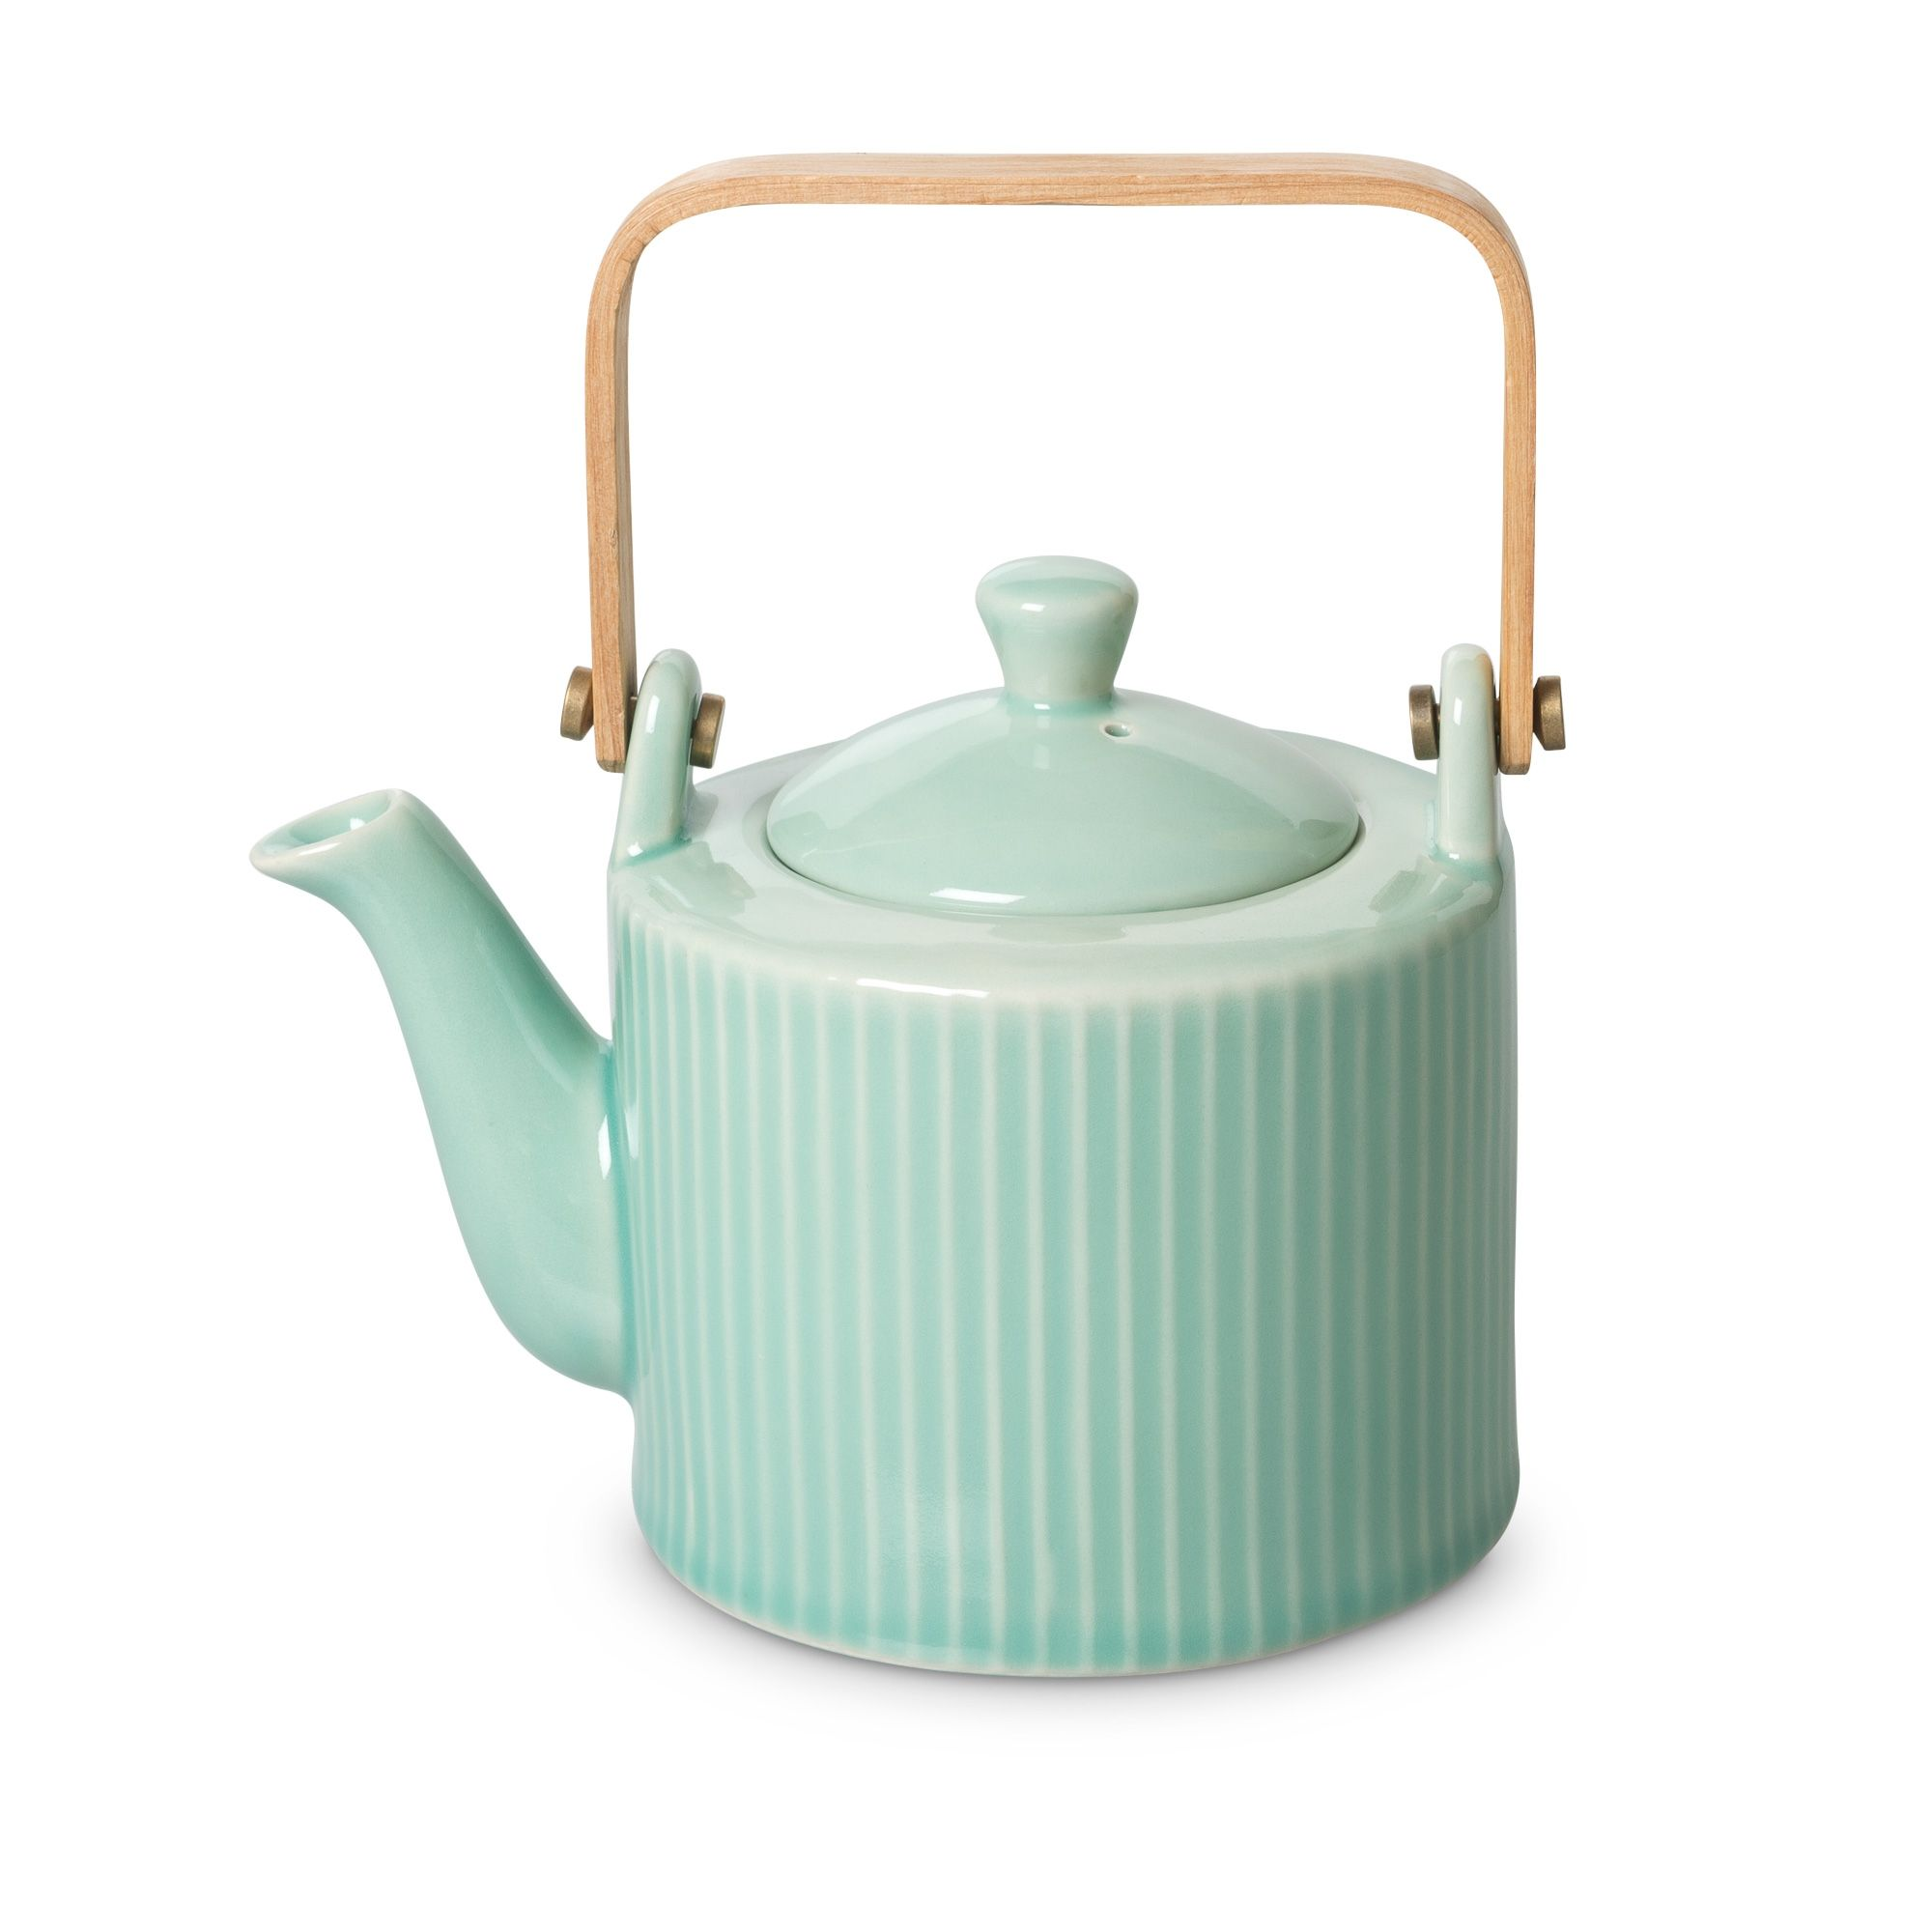 buy the ocha teapot at oliver bonas enjoy free uk standard delivery